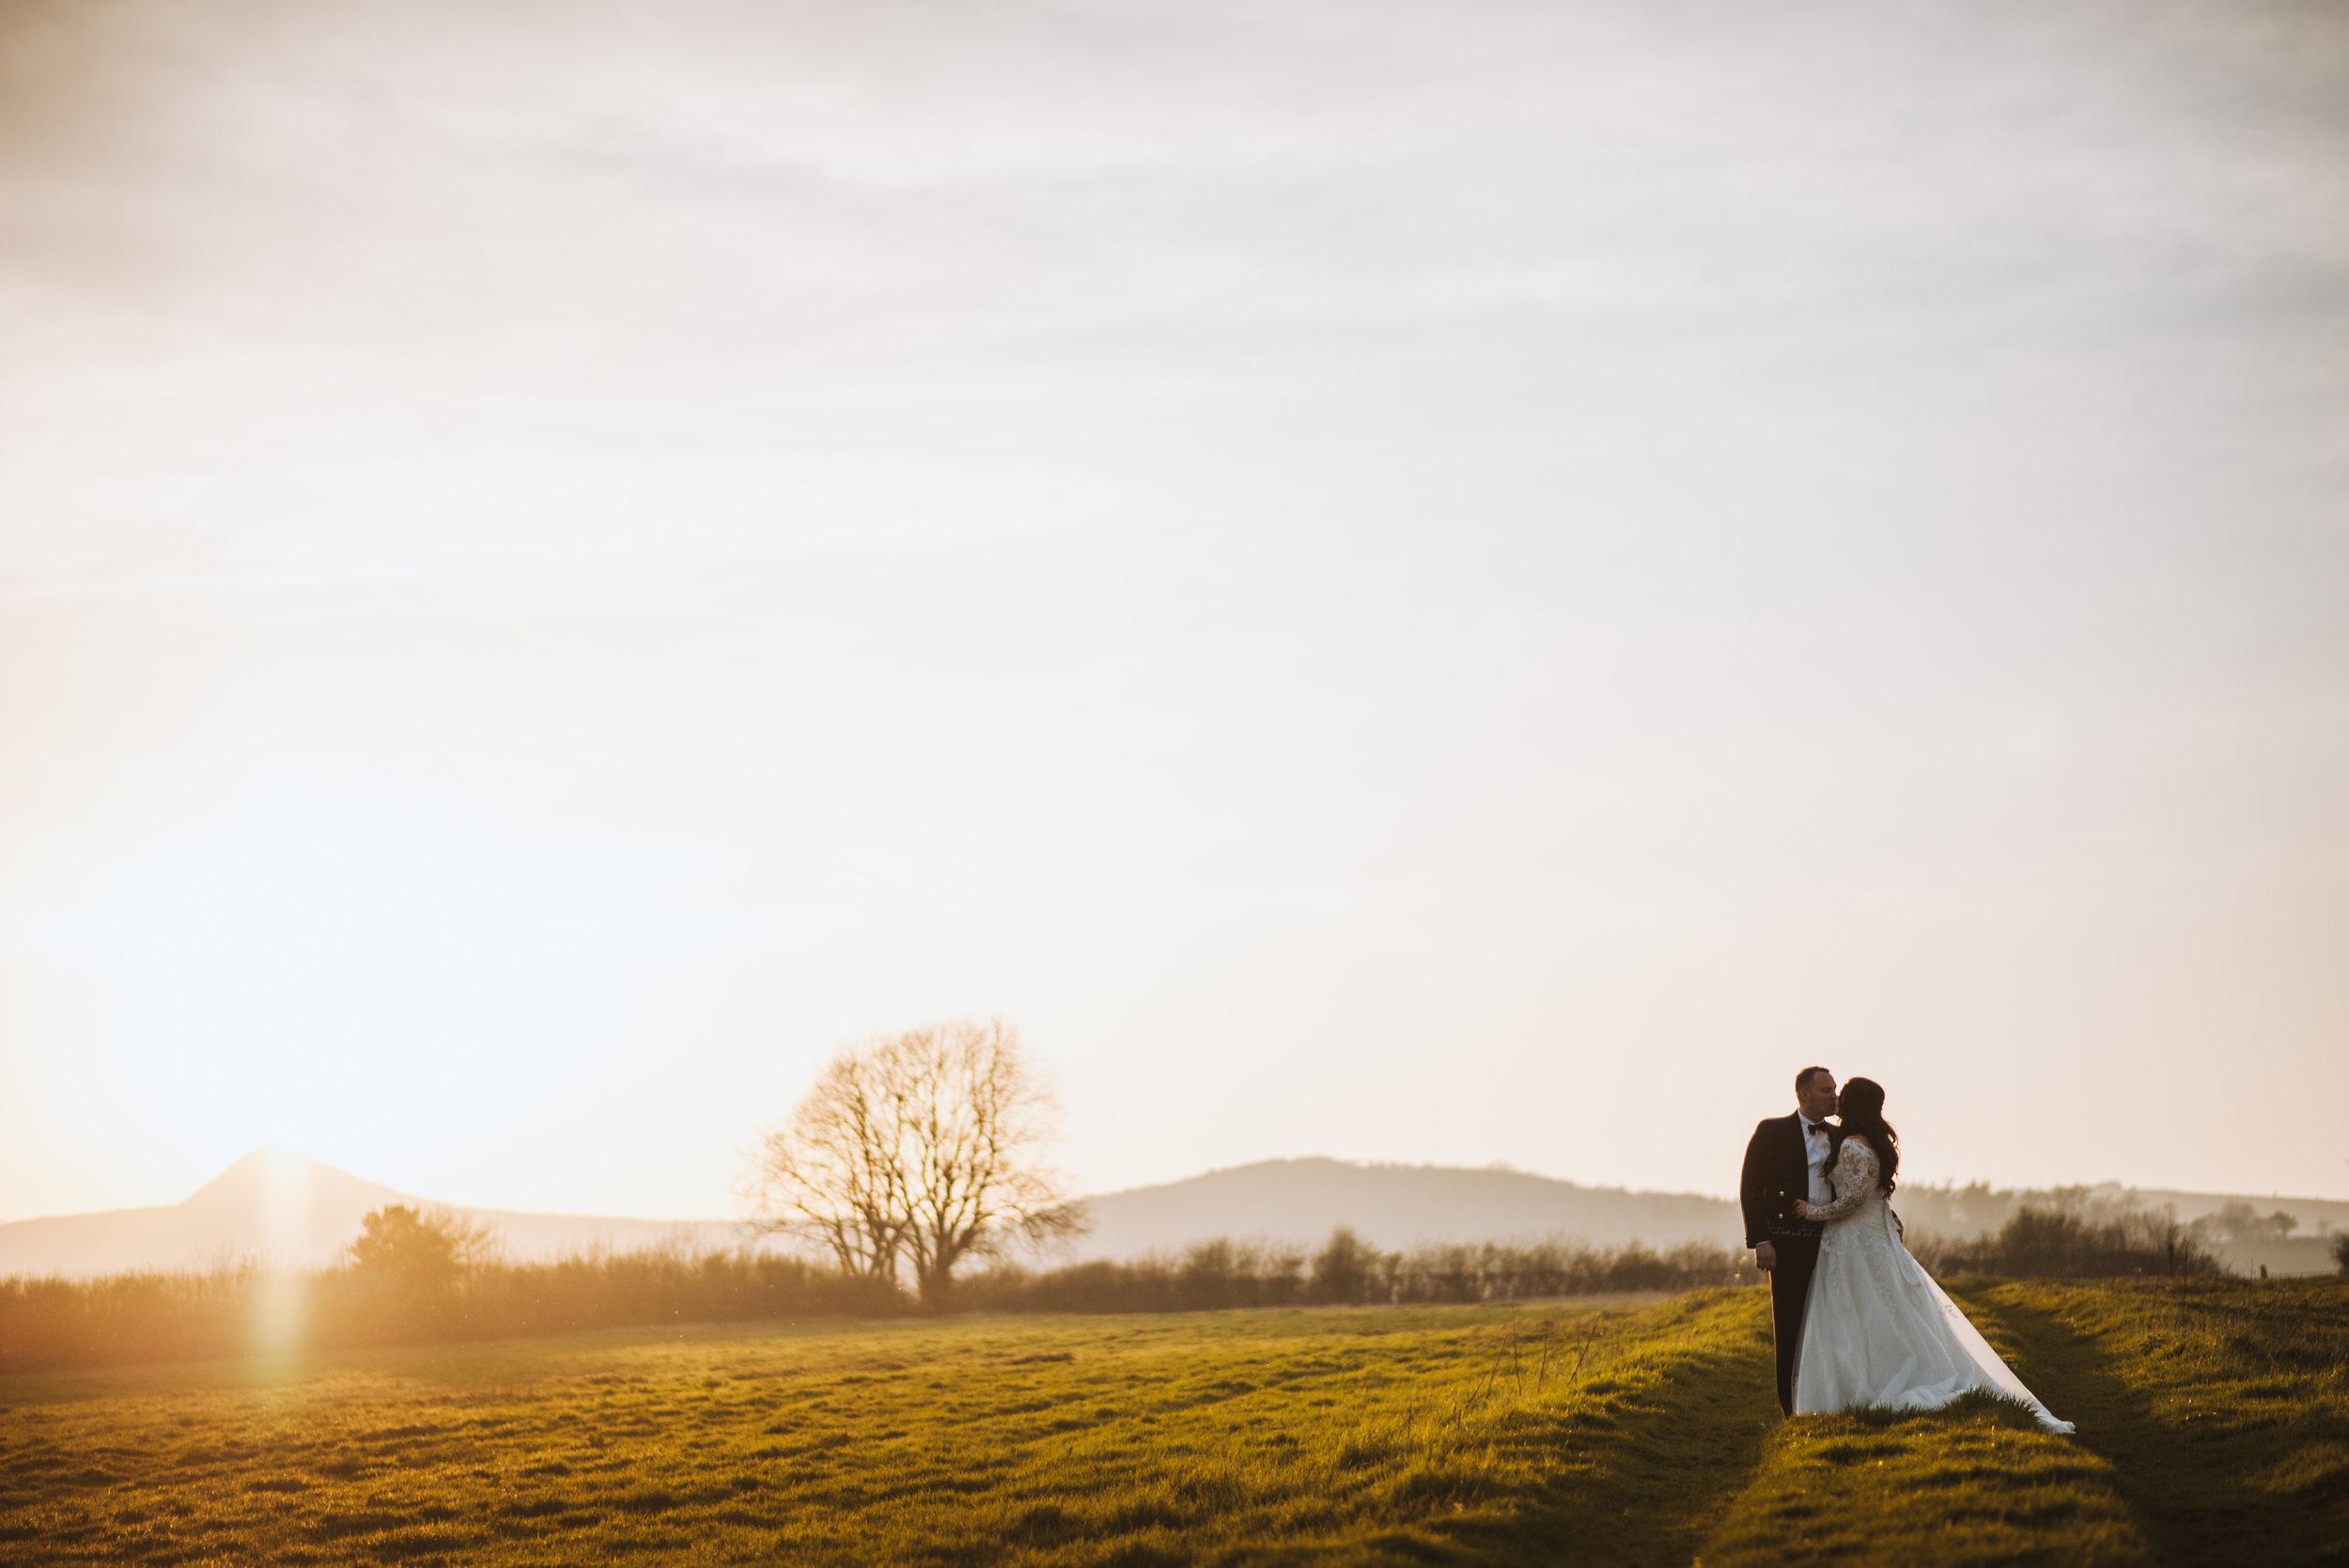 wedding-photographer-the-green-cornwall-19.jpg